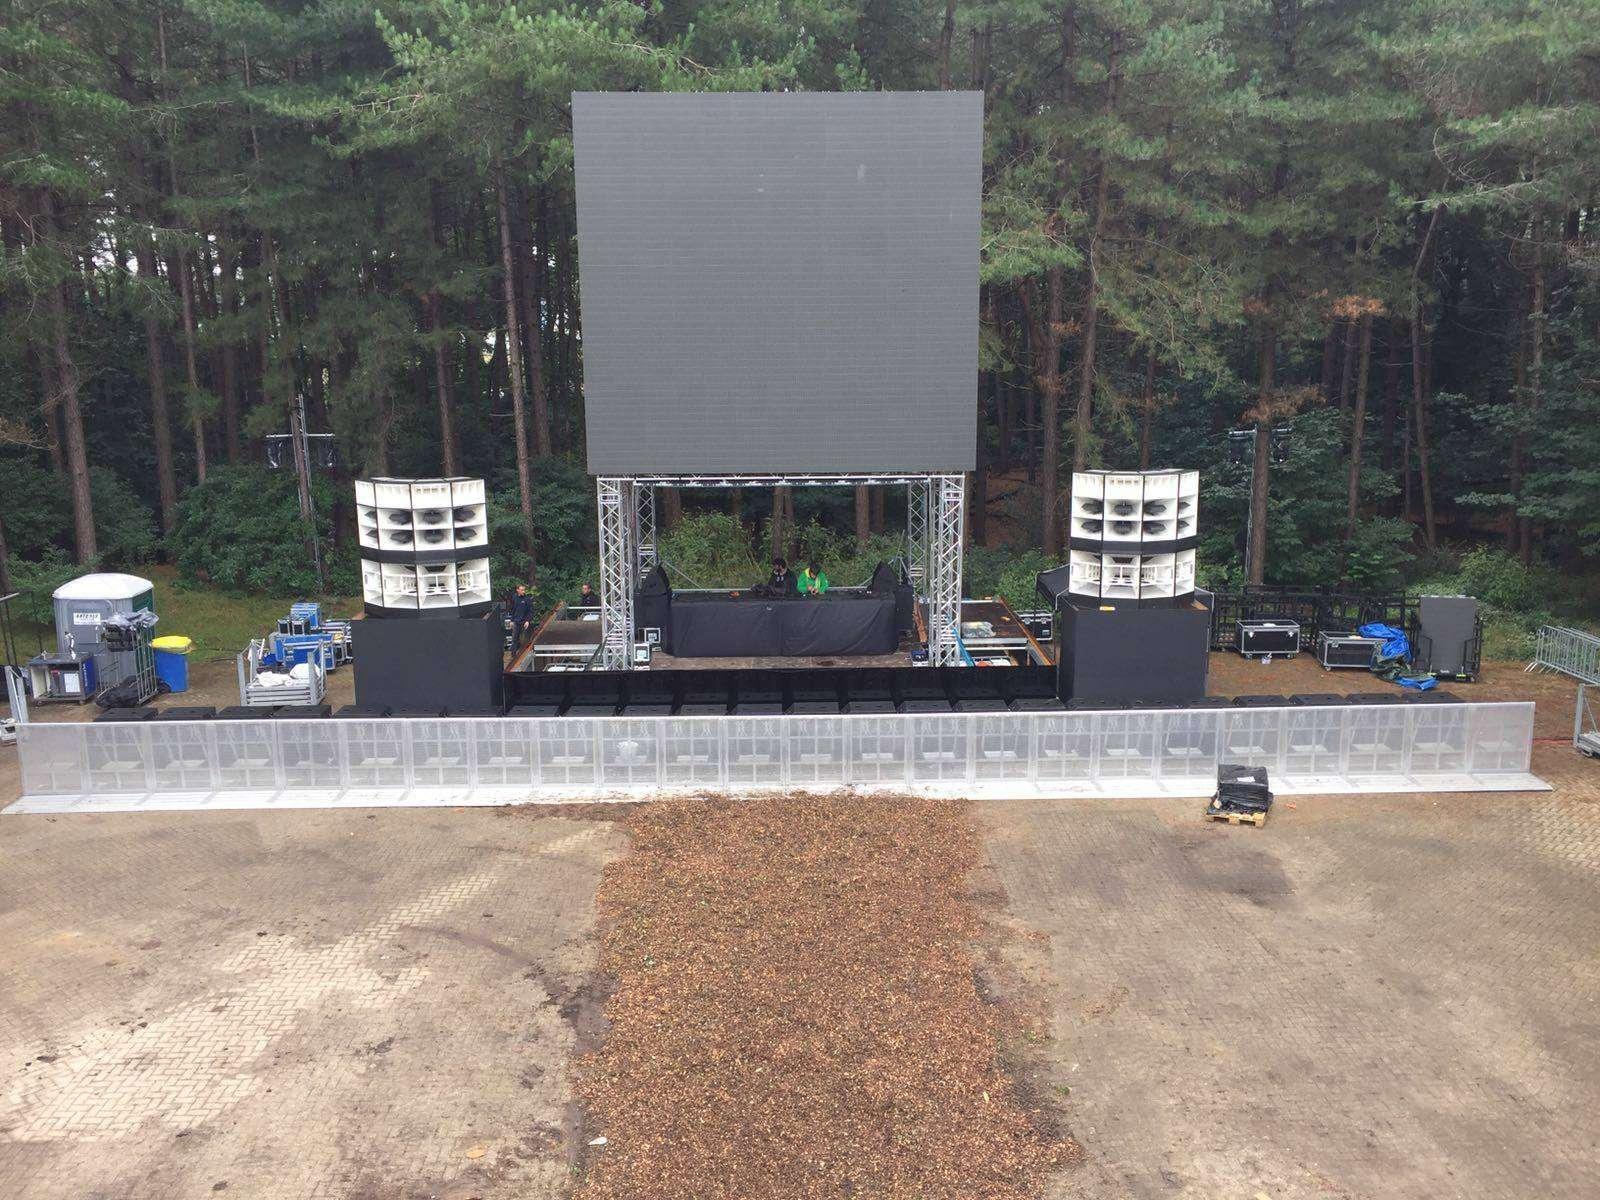 portugal festival forte 2018 le festival sera enti rement sonoris par lambda labs electro. Black Bedroom Furniture Sets. Home Design Ideas